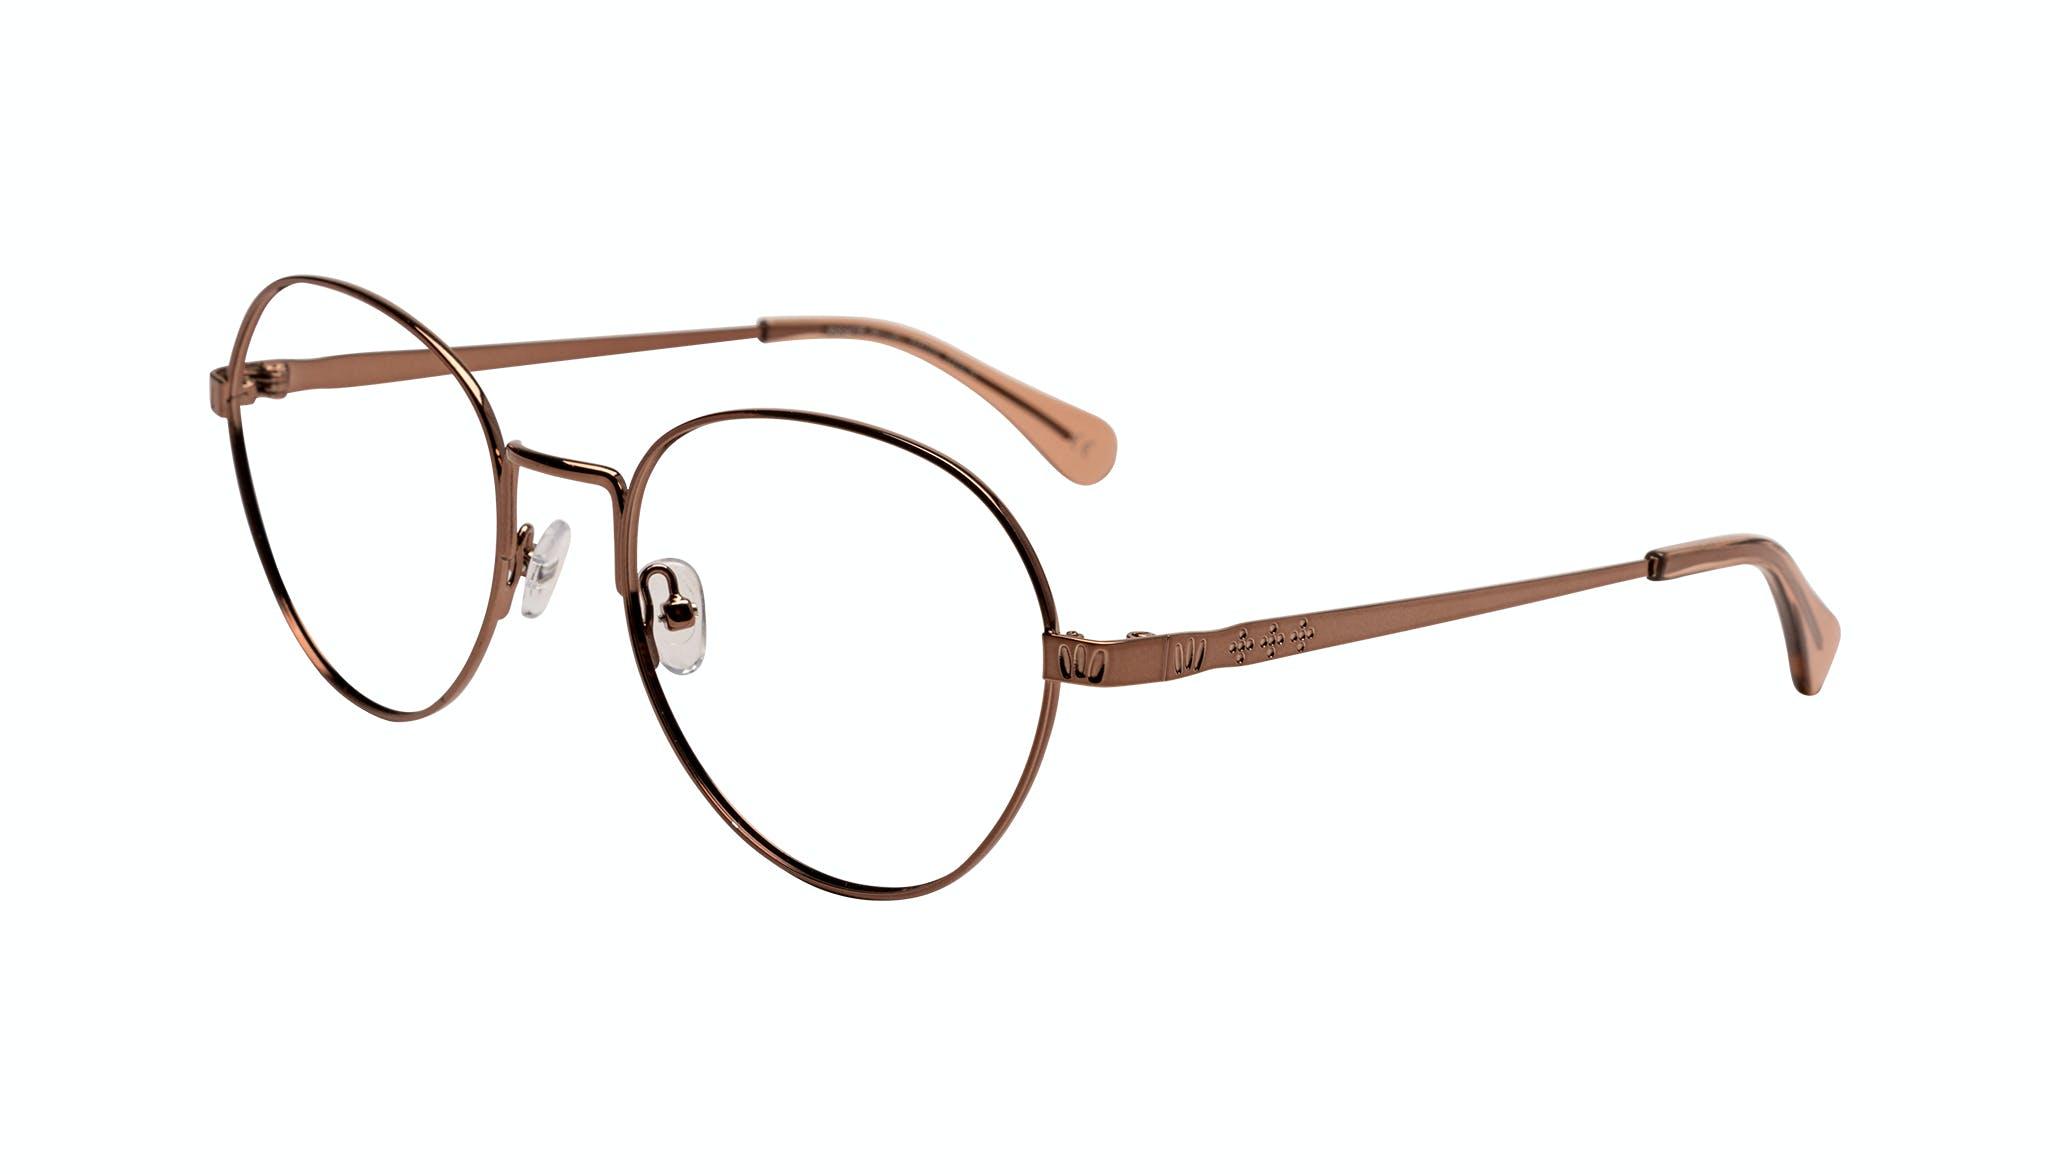 Affordable Fashion Glasses Round Eyeglasses Women Brace Plus Rose Gold Tilt